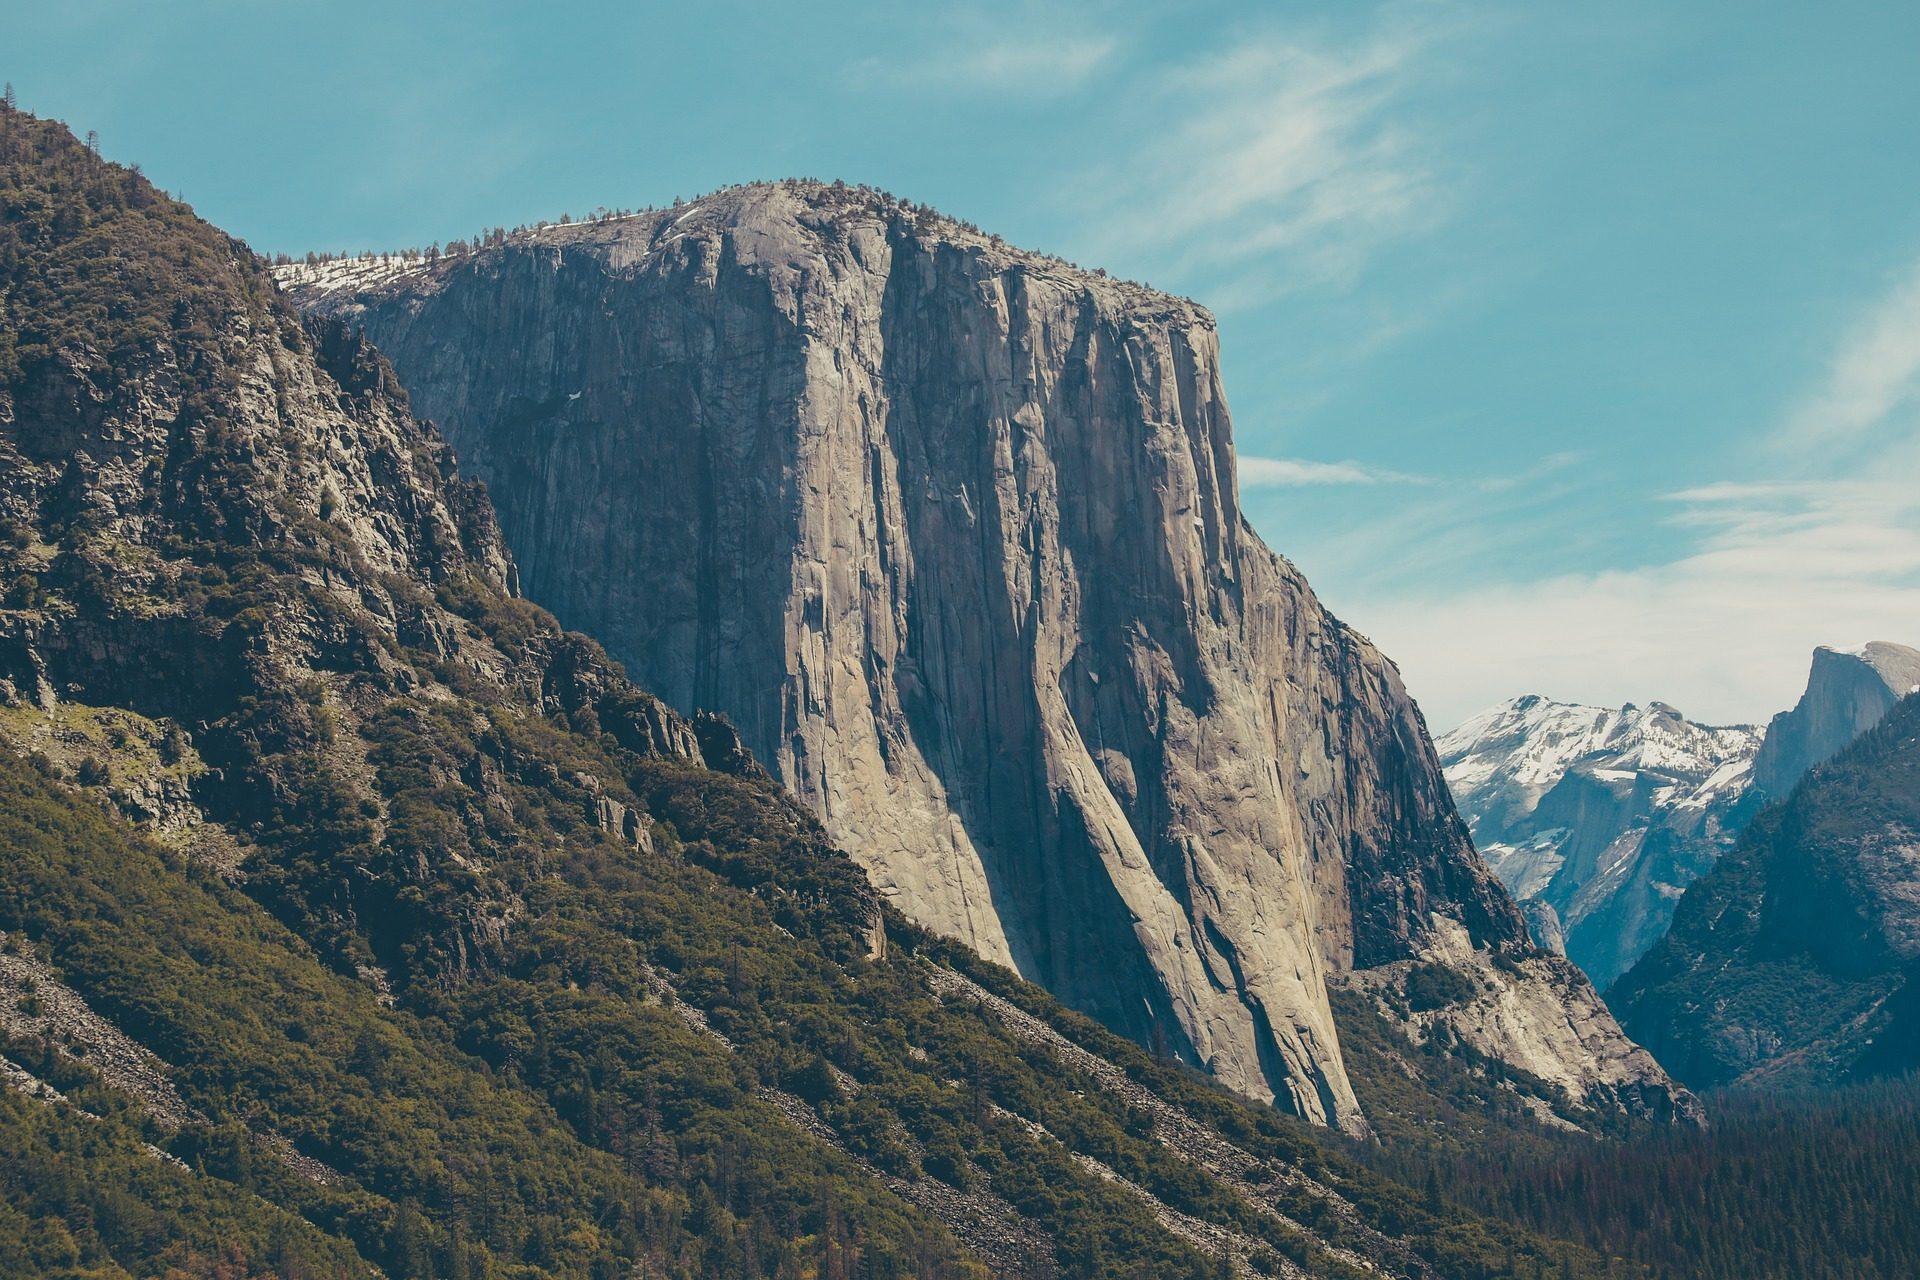 Montañas, वन, पेड़, ऊंचाइयों, बर्फ, ढाल - HD वॉलपेपर - प्रोफेसर-falken.com